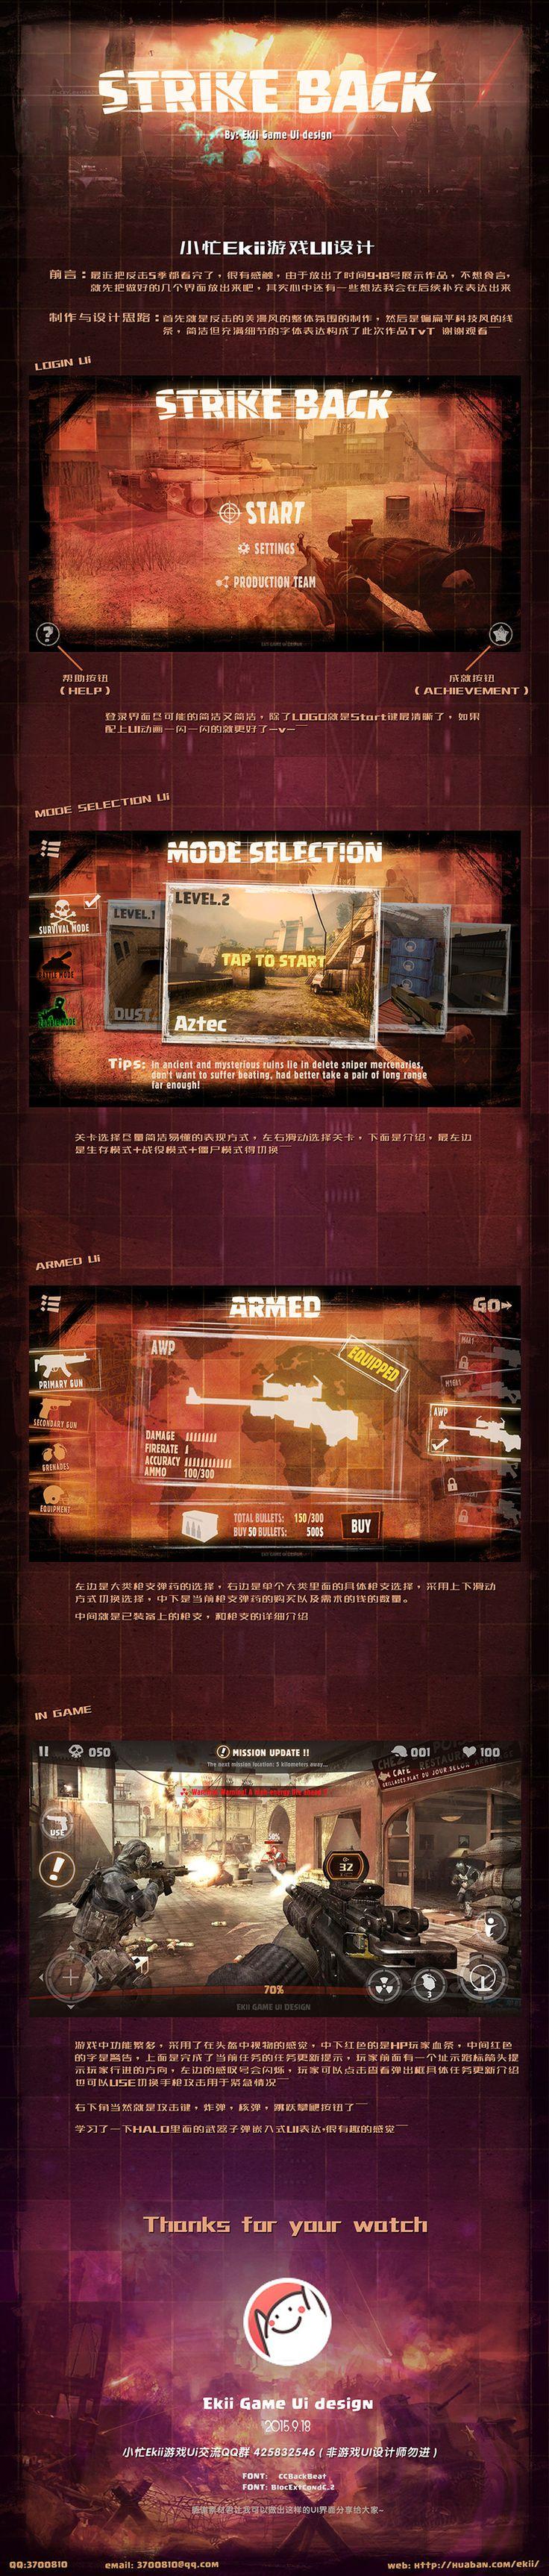 ben-will-ekii-game-ui-design-strike-back.jpg (840×3942)